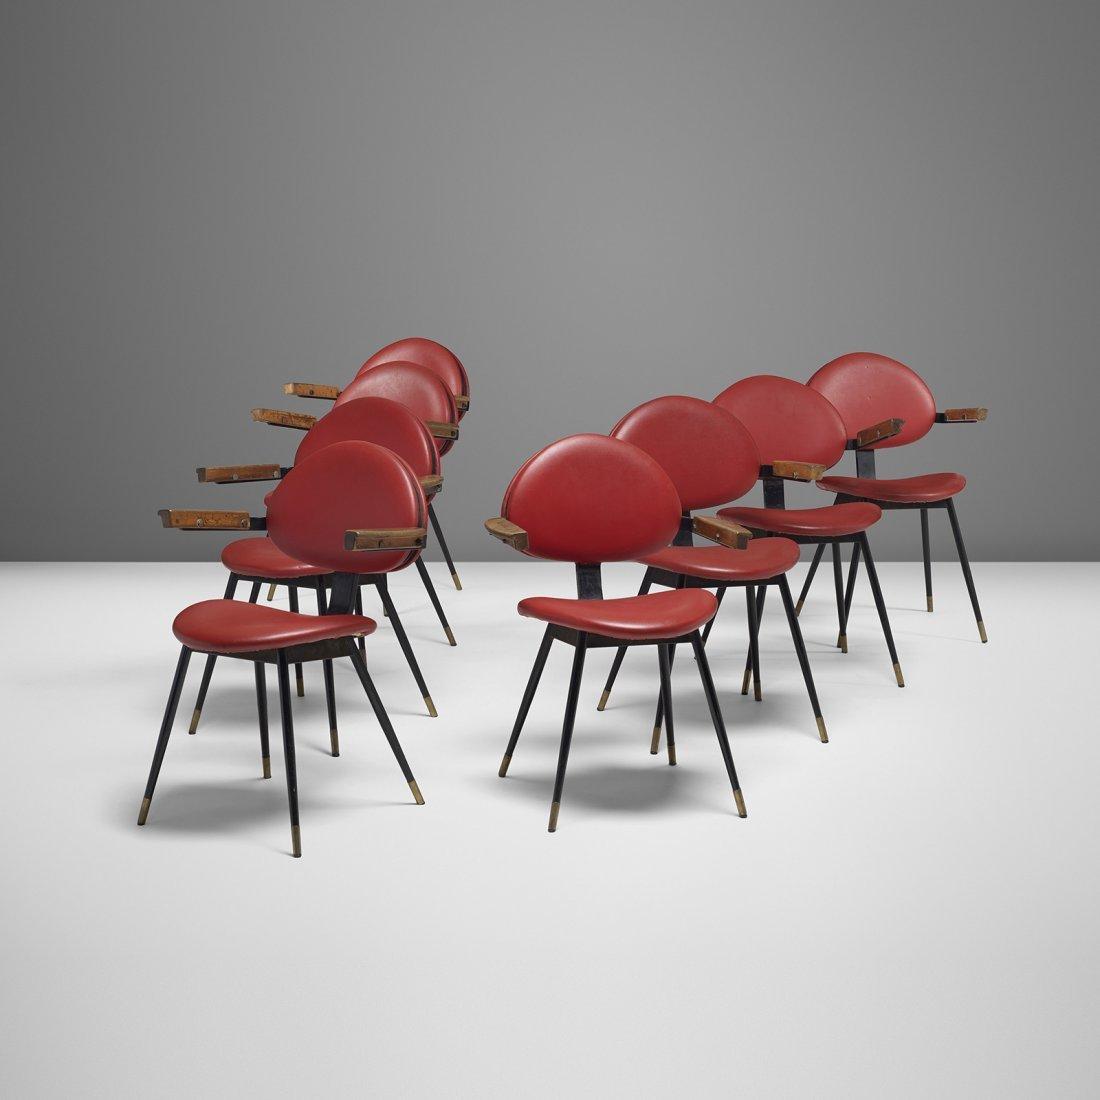 Carlo Mollino set of eight chairs